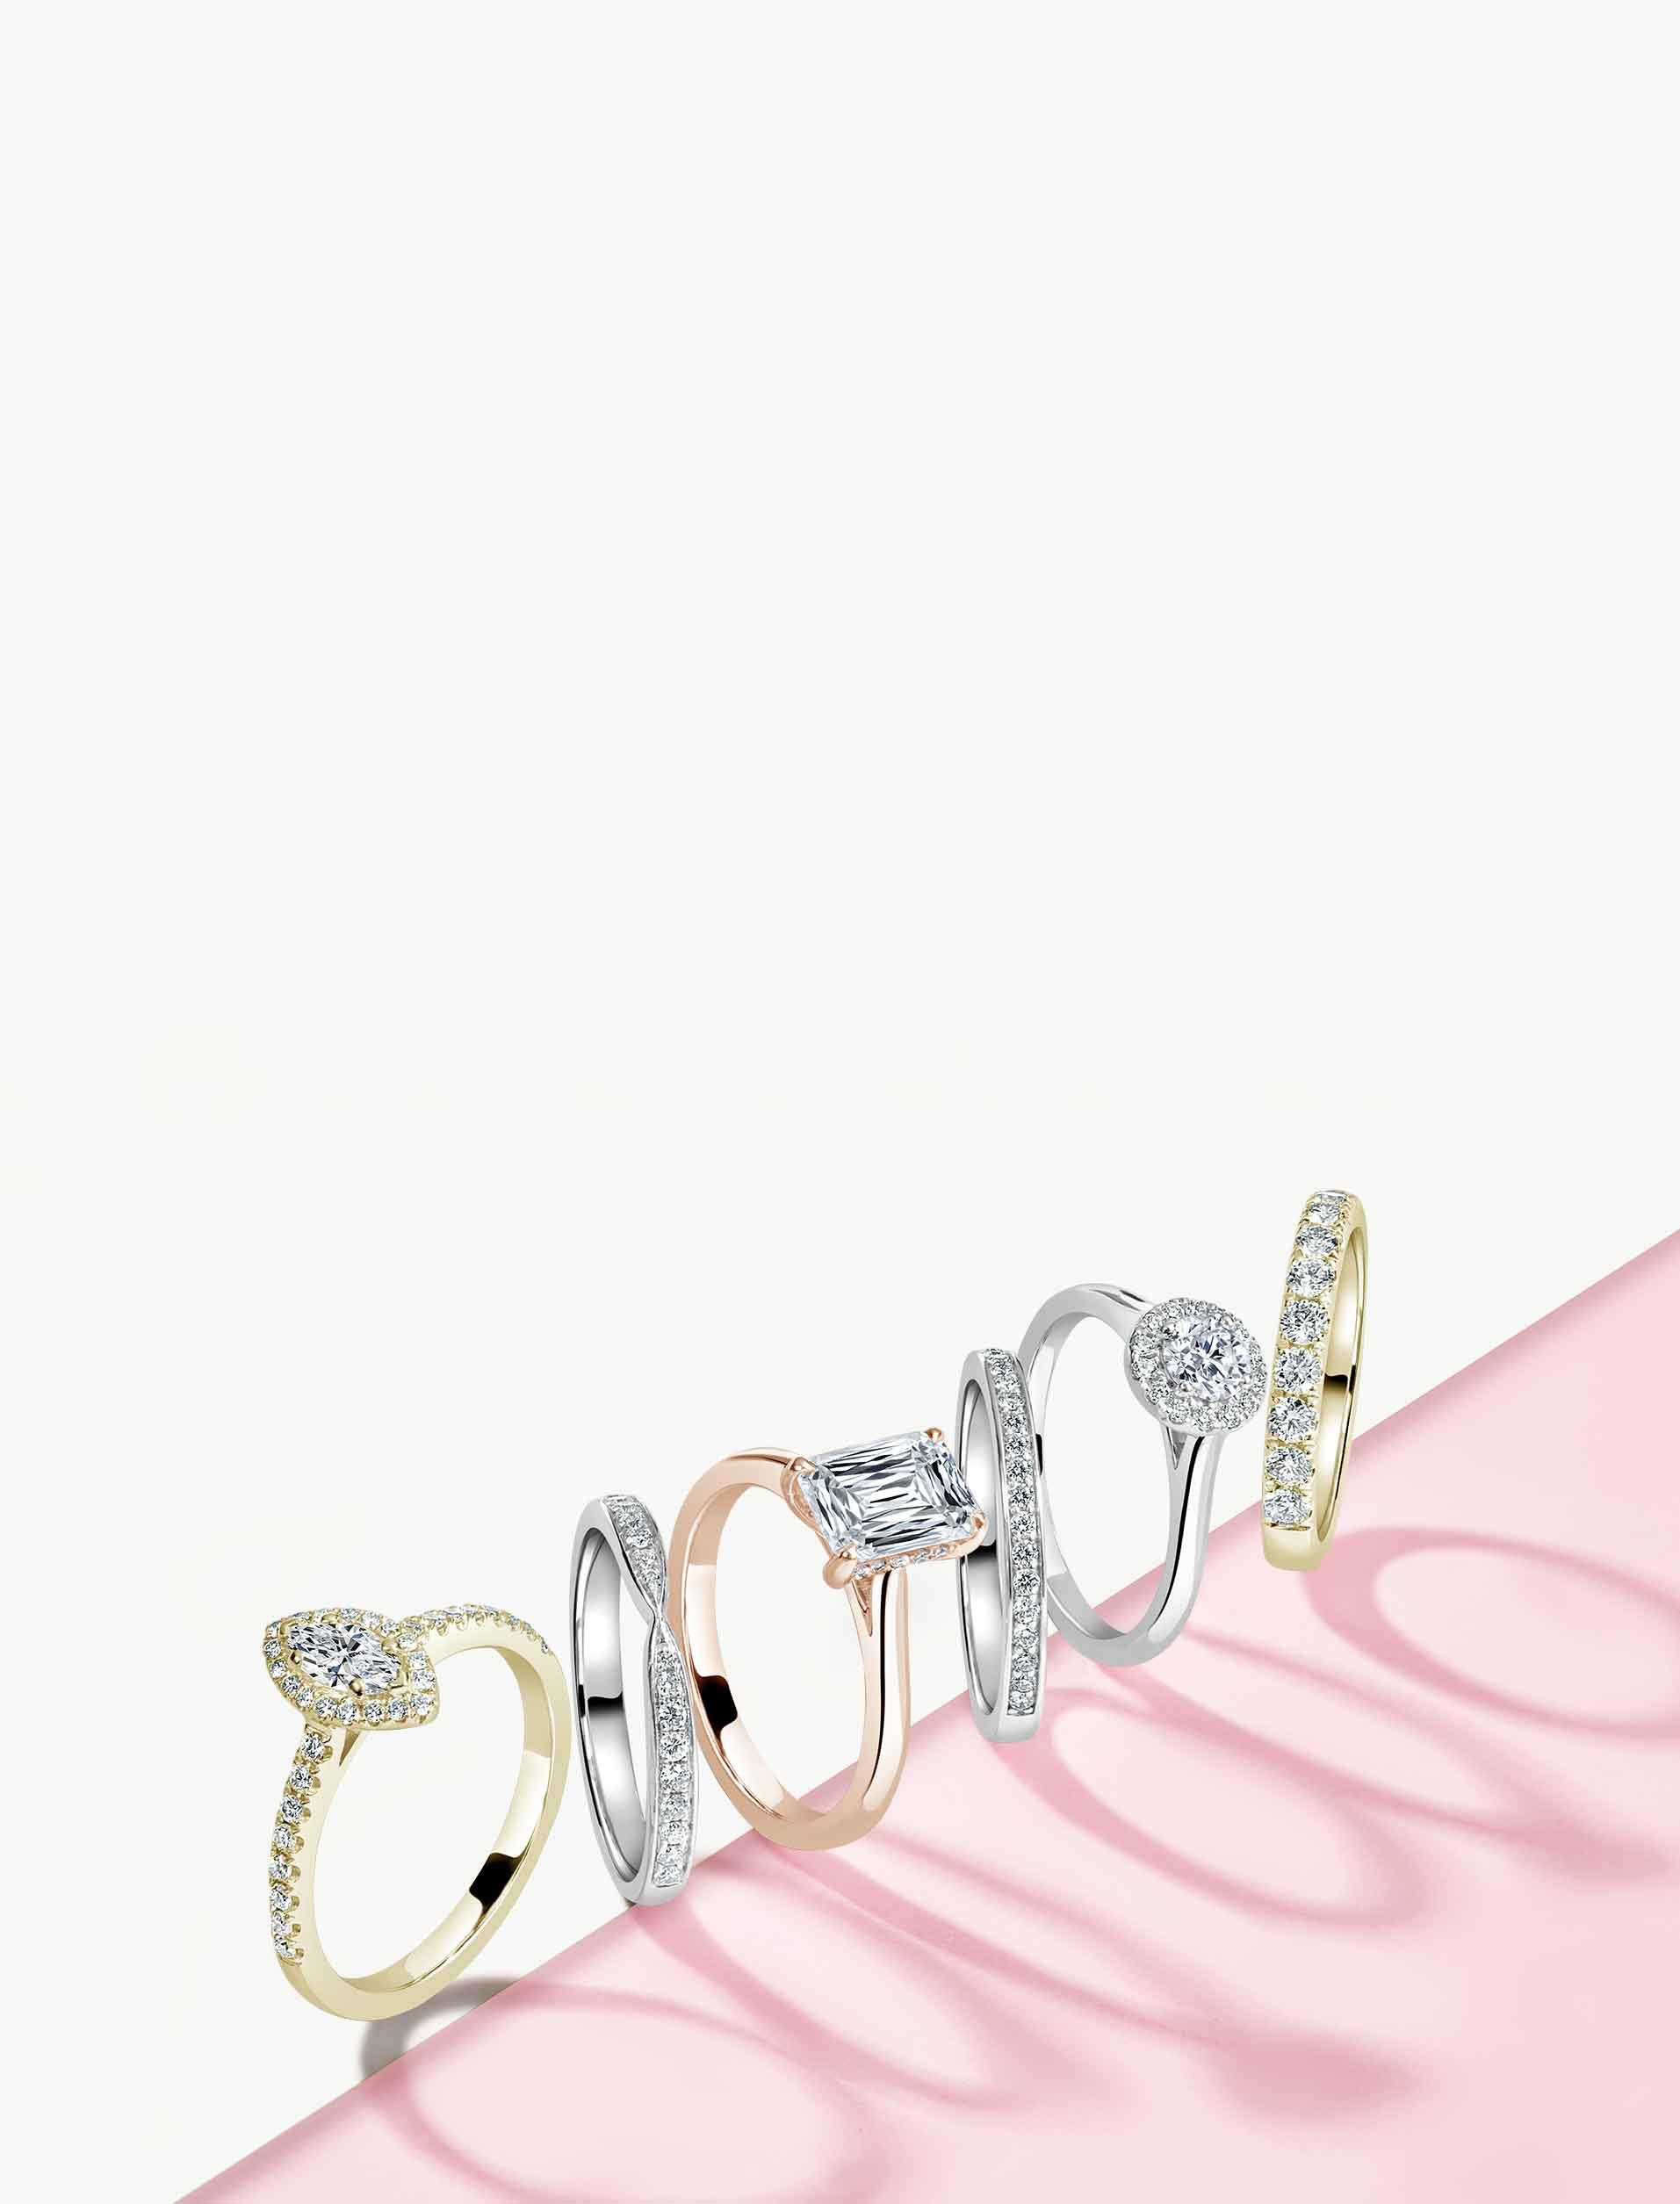 Rose Gold Halo Engagement Rings - Steven Stone